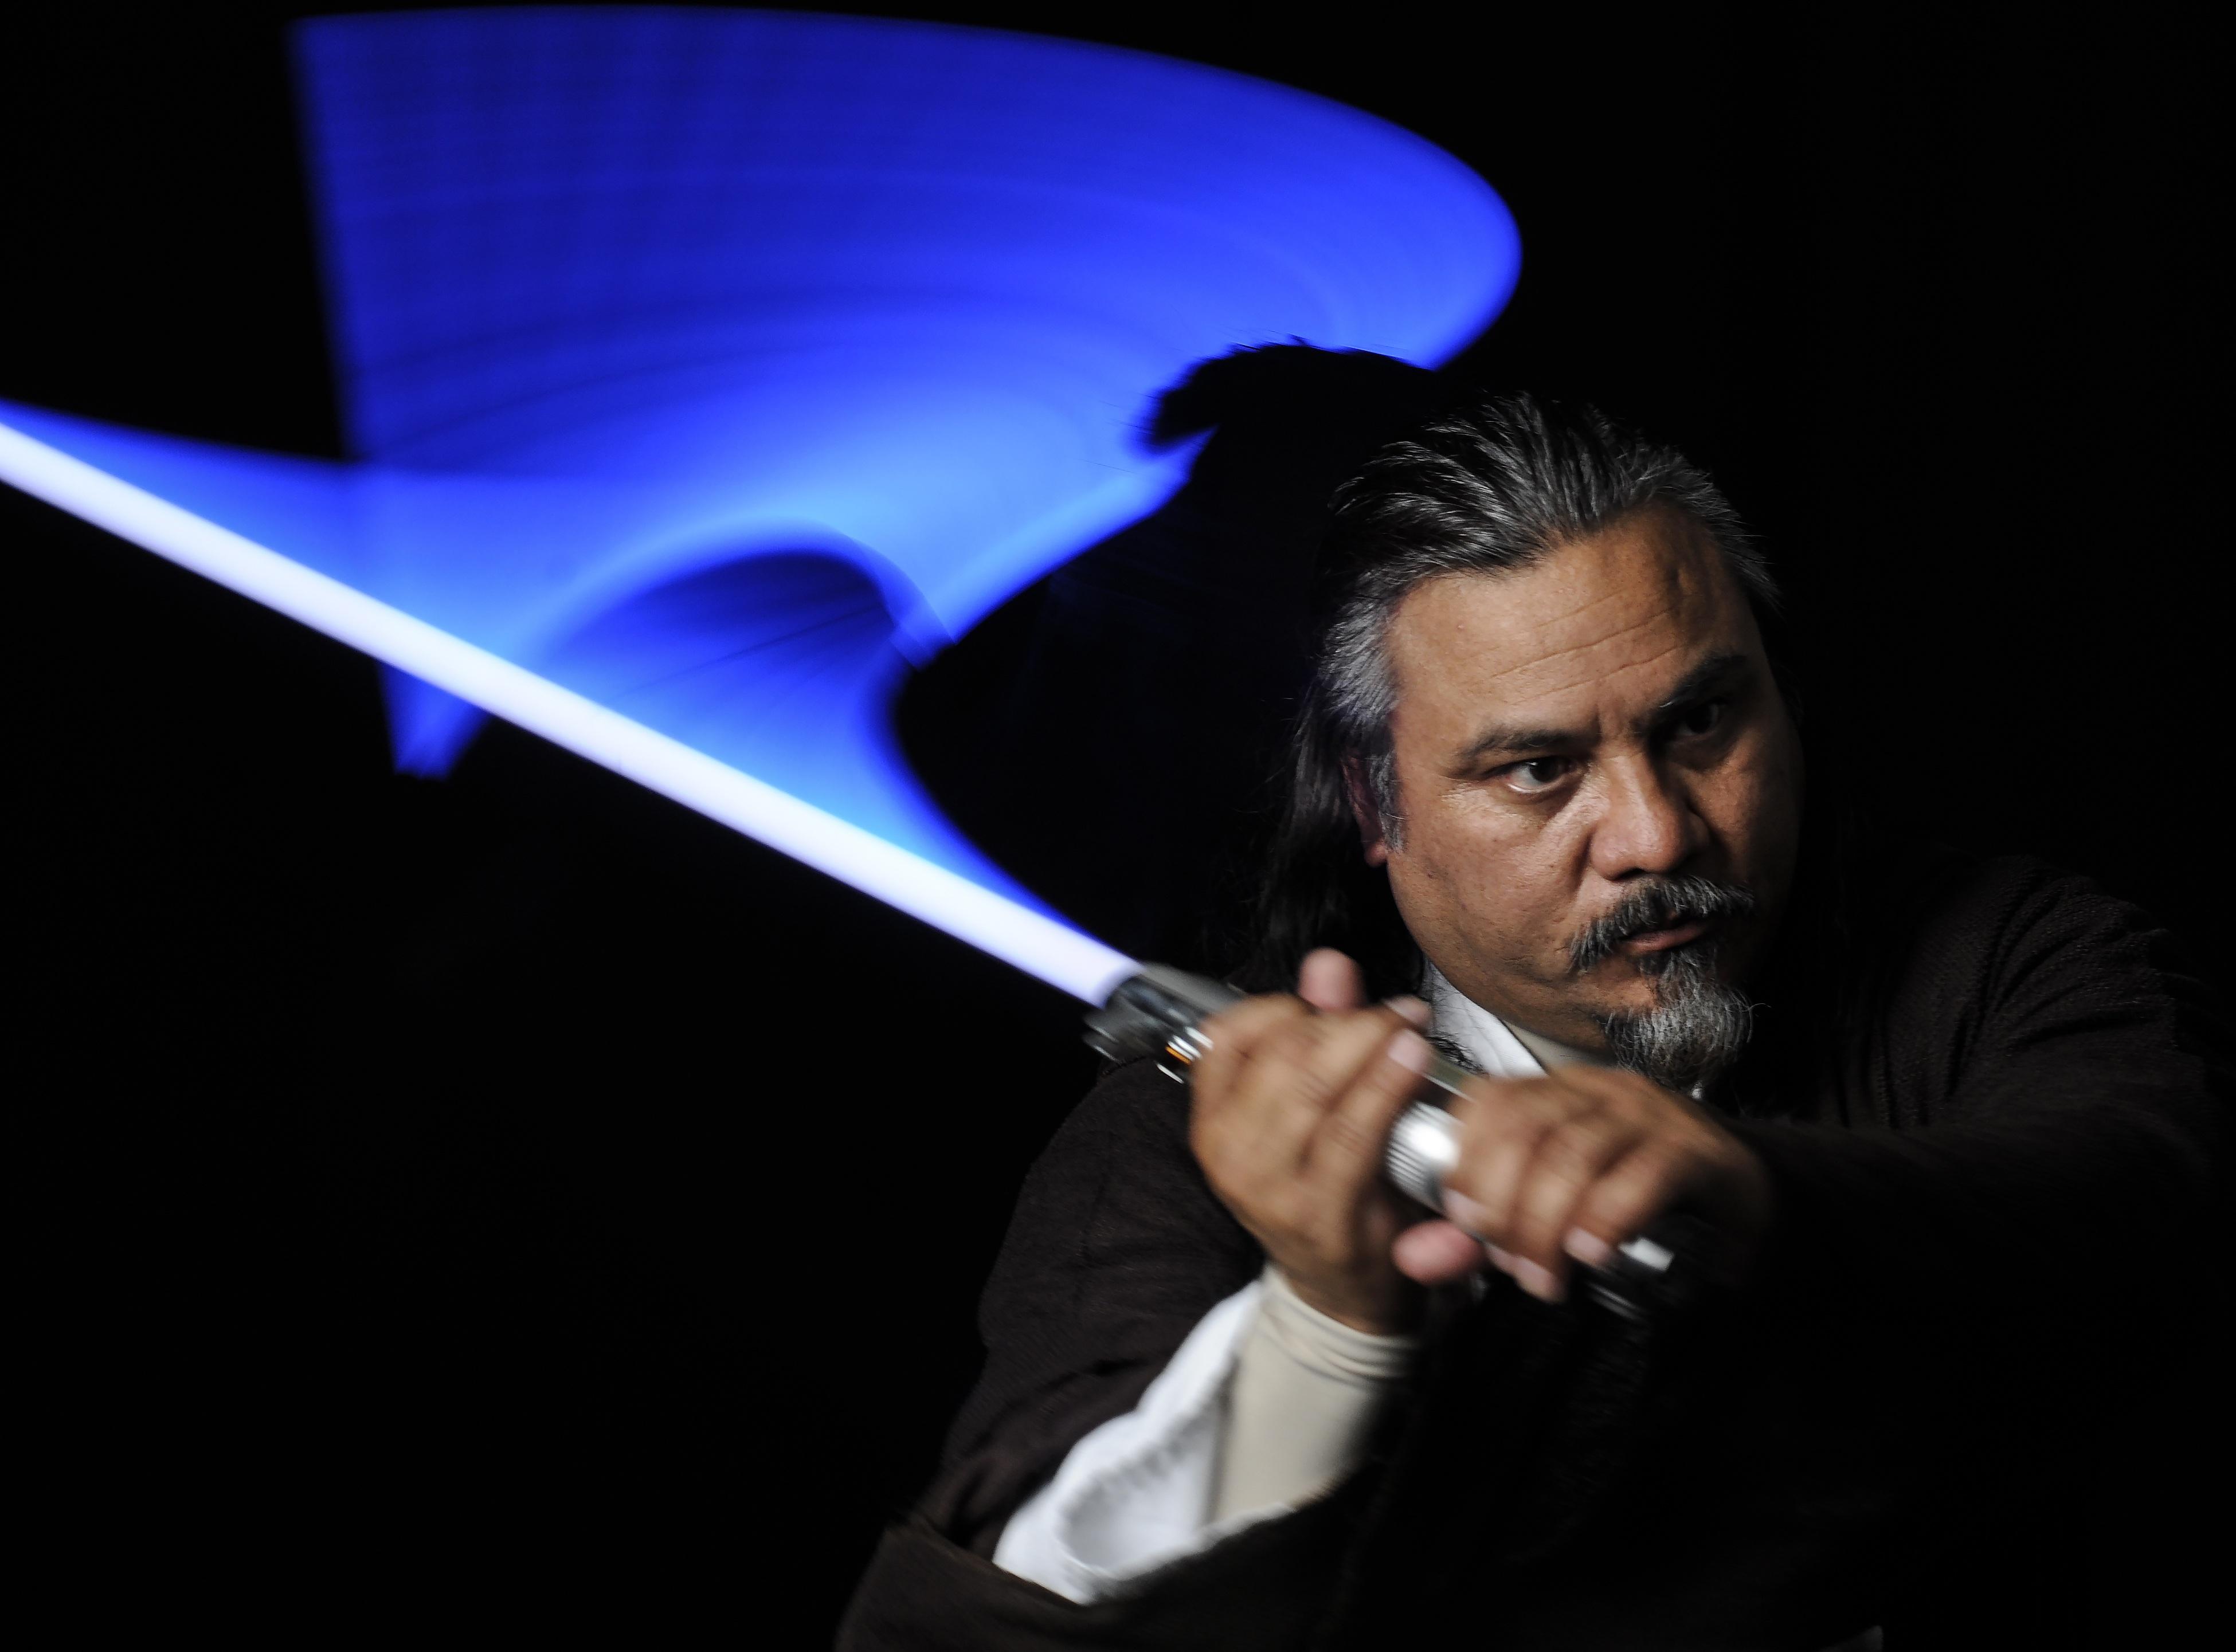 Lightning sword photo